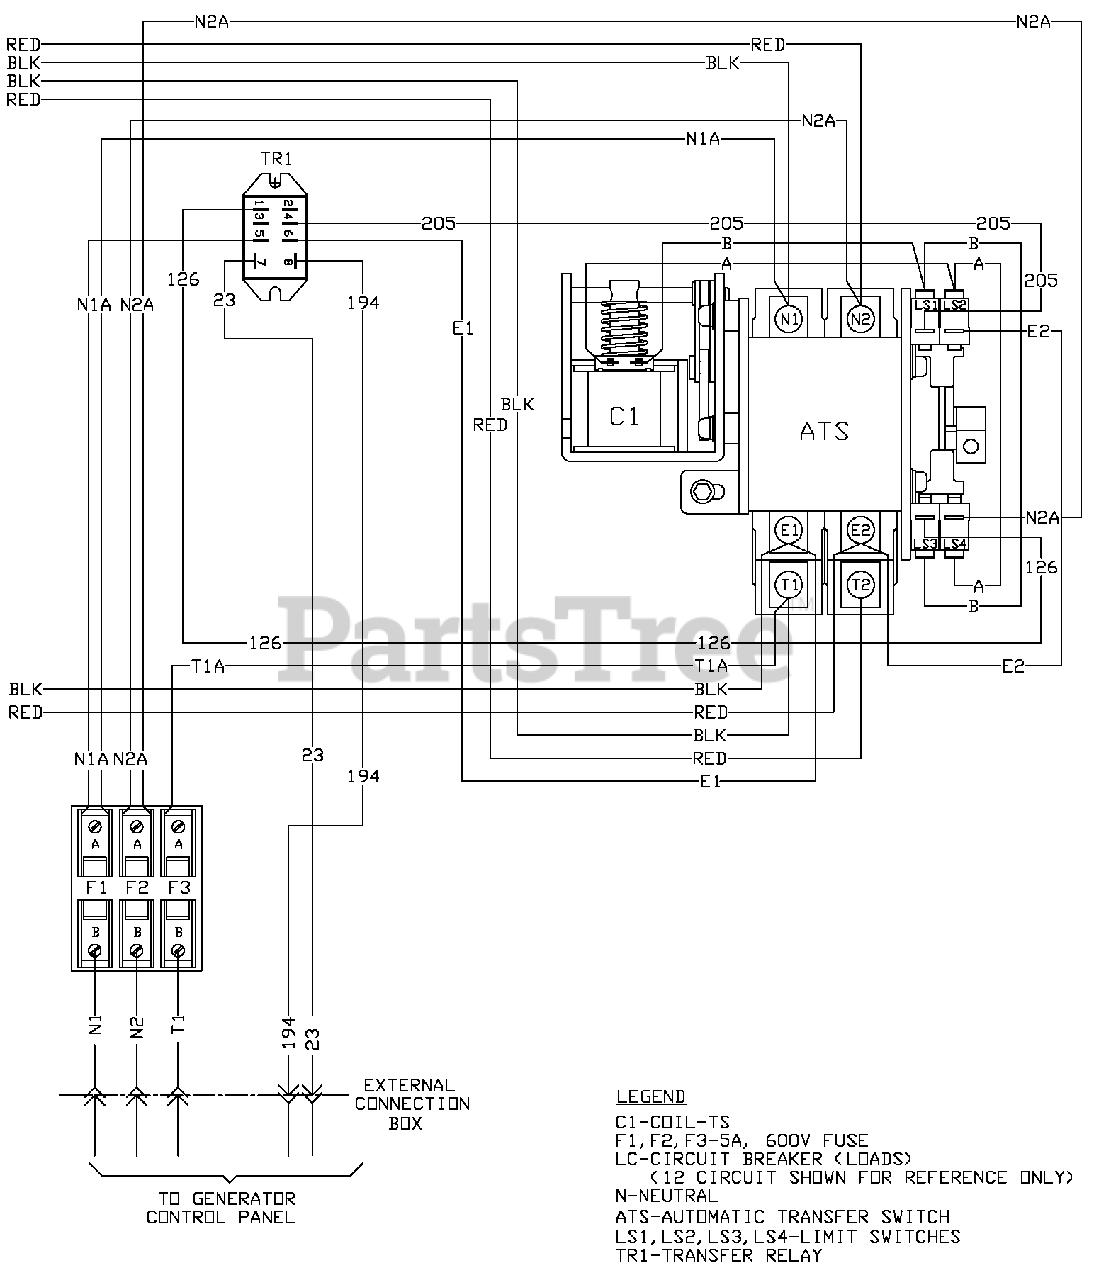 Transfer Switch Wiring Diagrams Generac from www.partstree.com